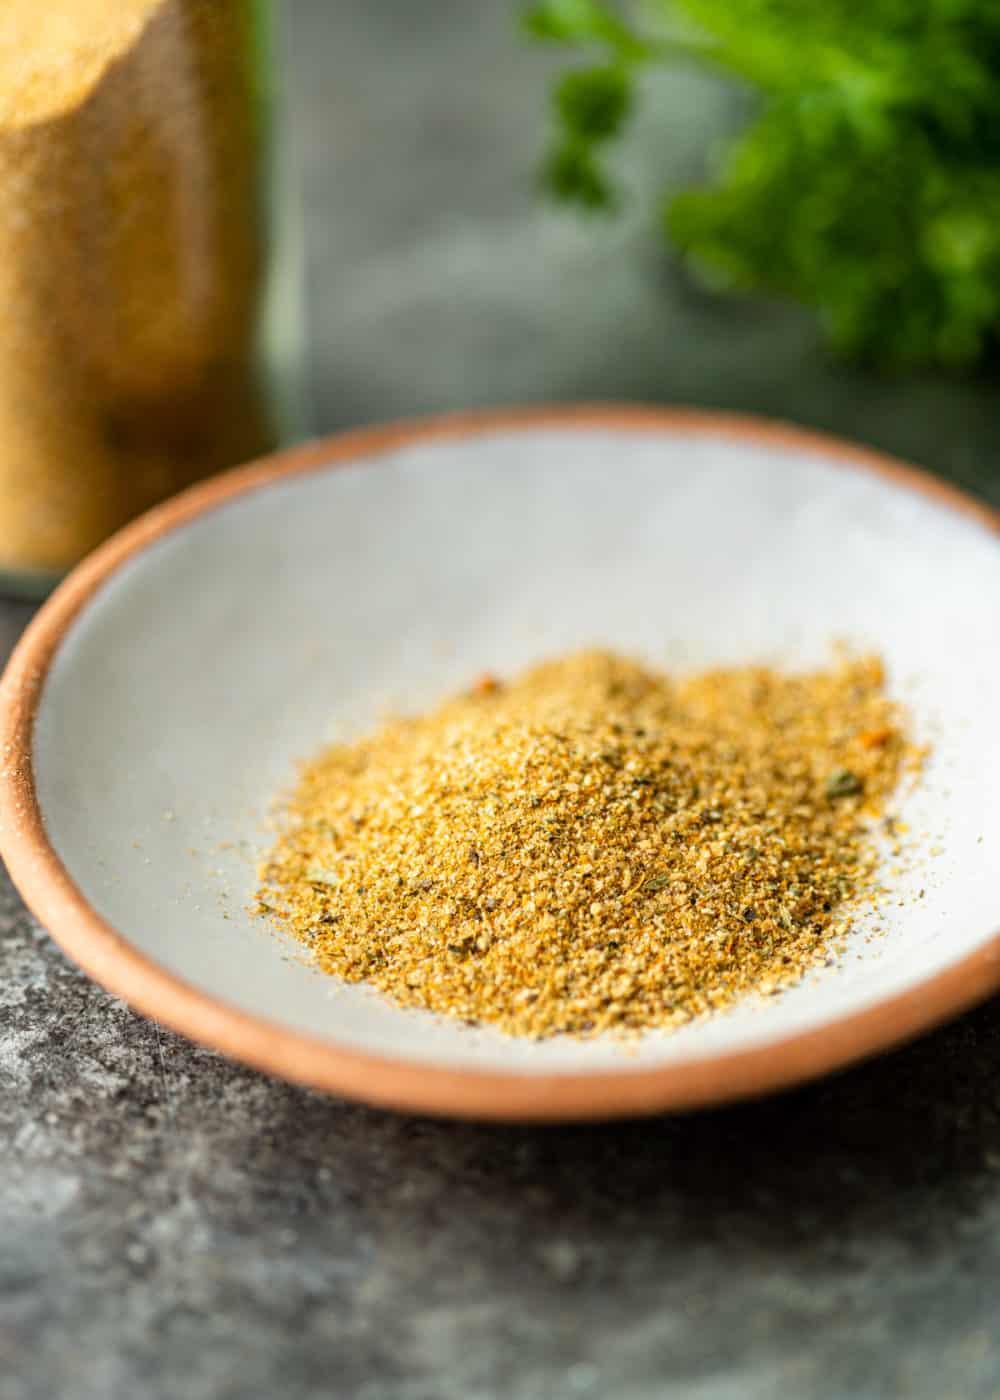 mixture of no salt seasoning in small white bowl